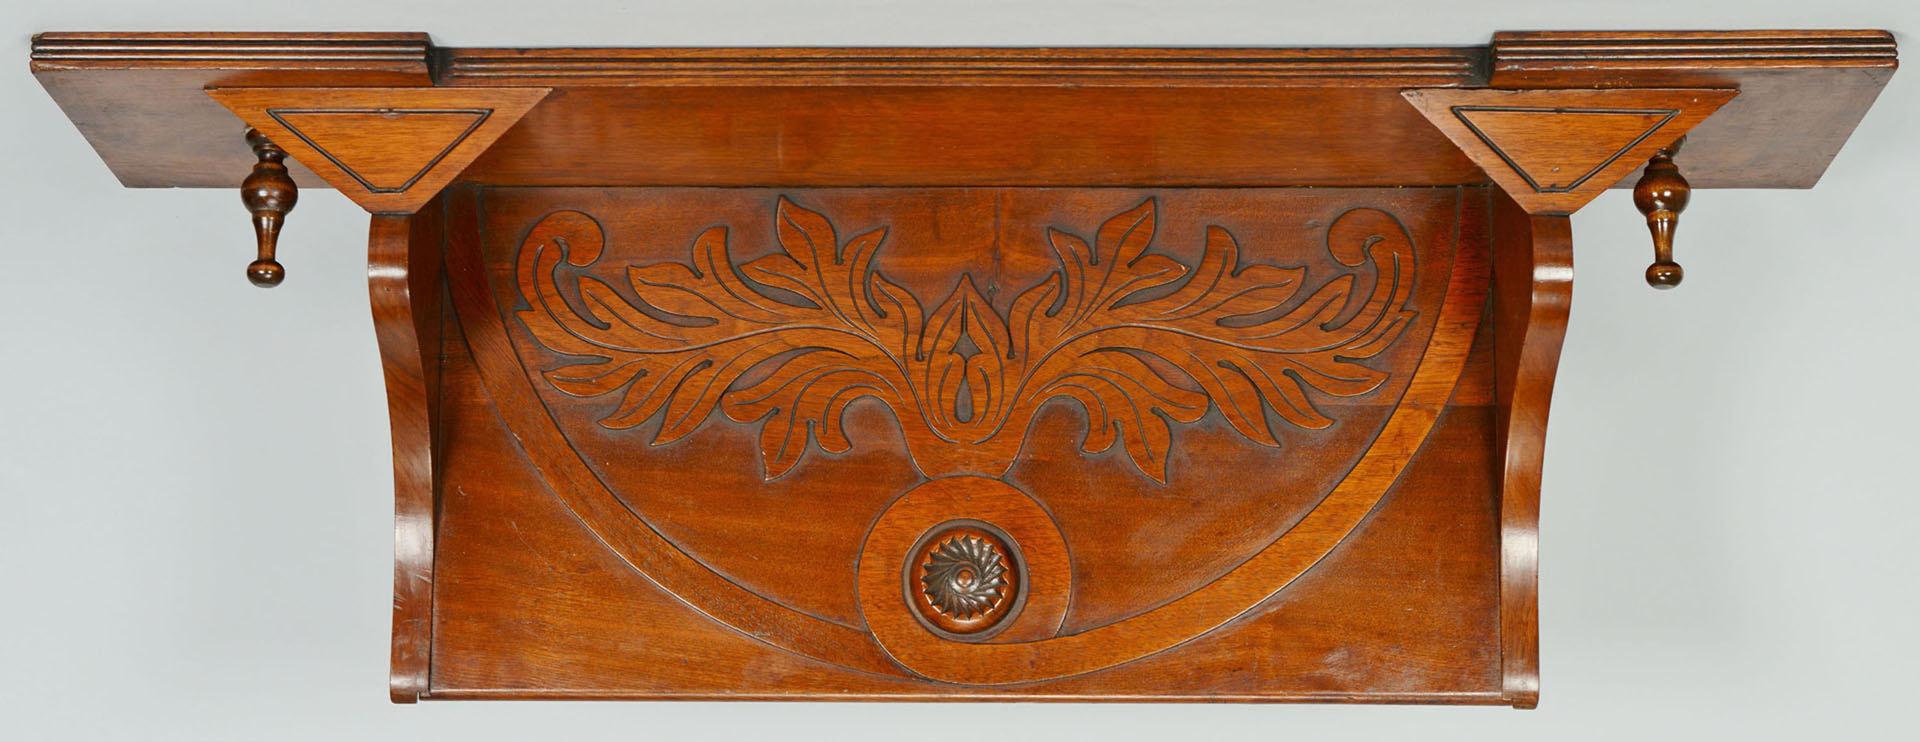 Lot 423: Carved Aesthetic Movement Walnut Hanging Shelf